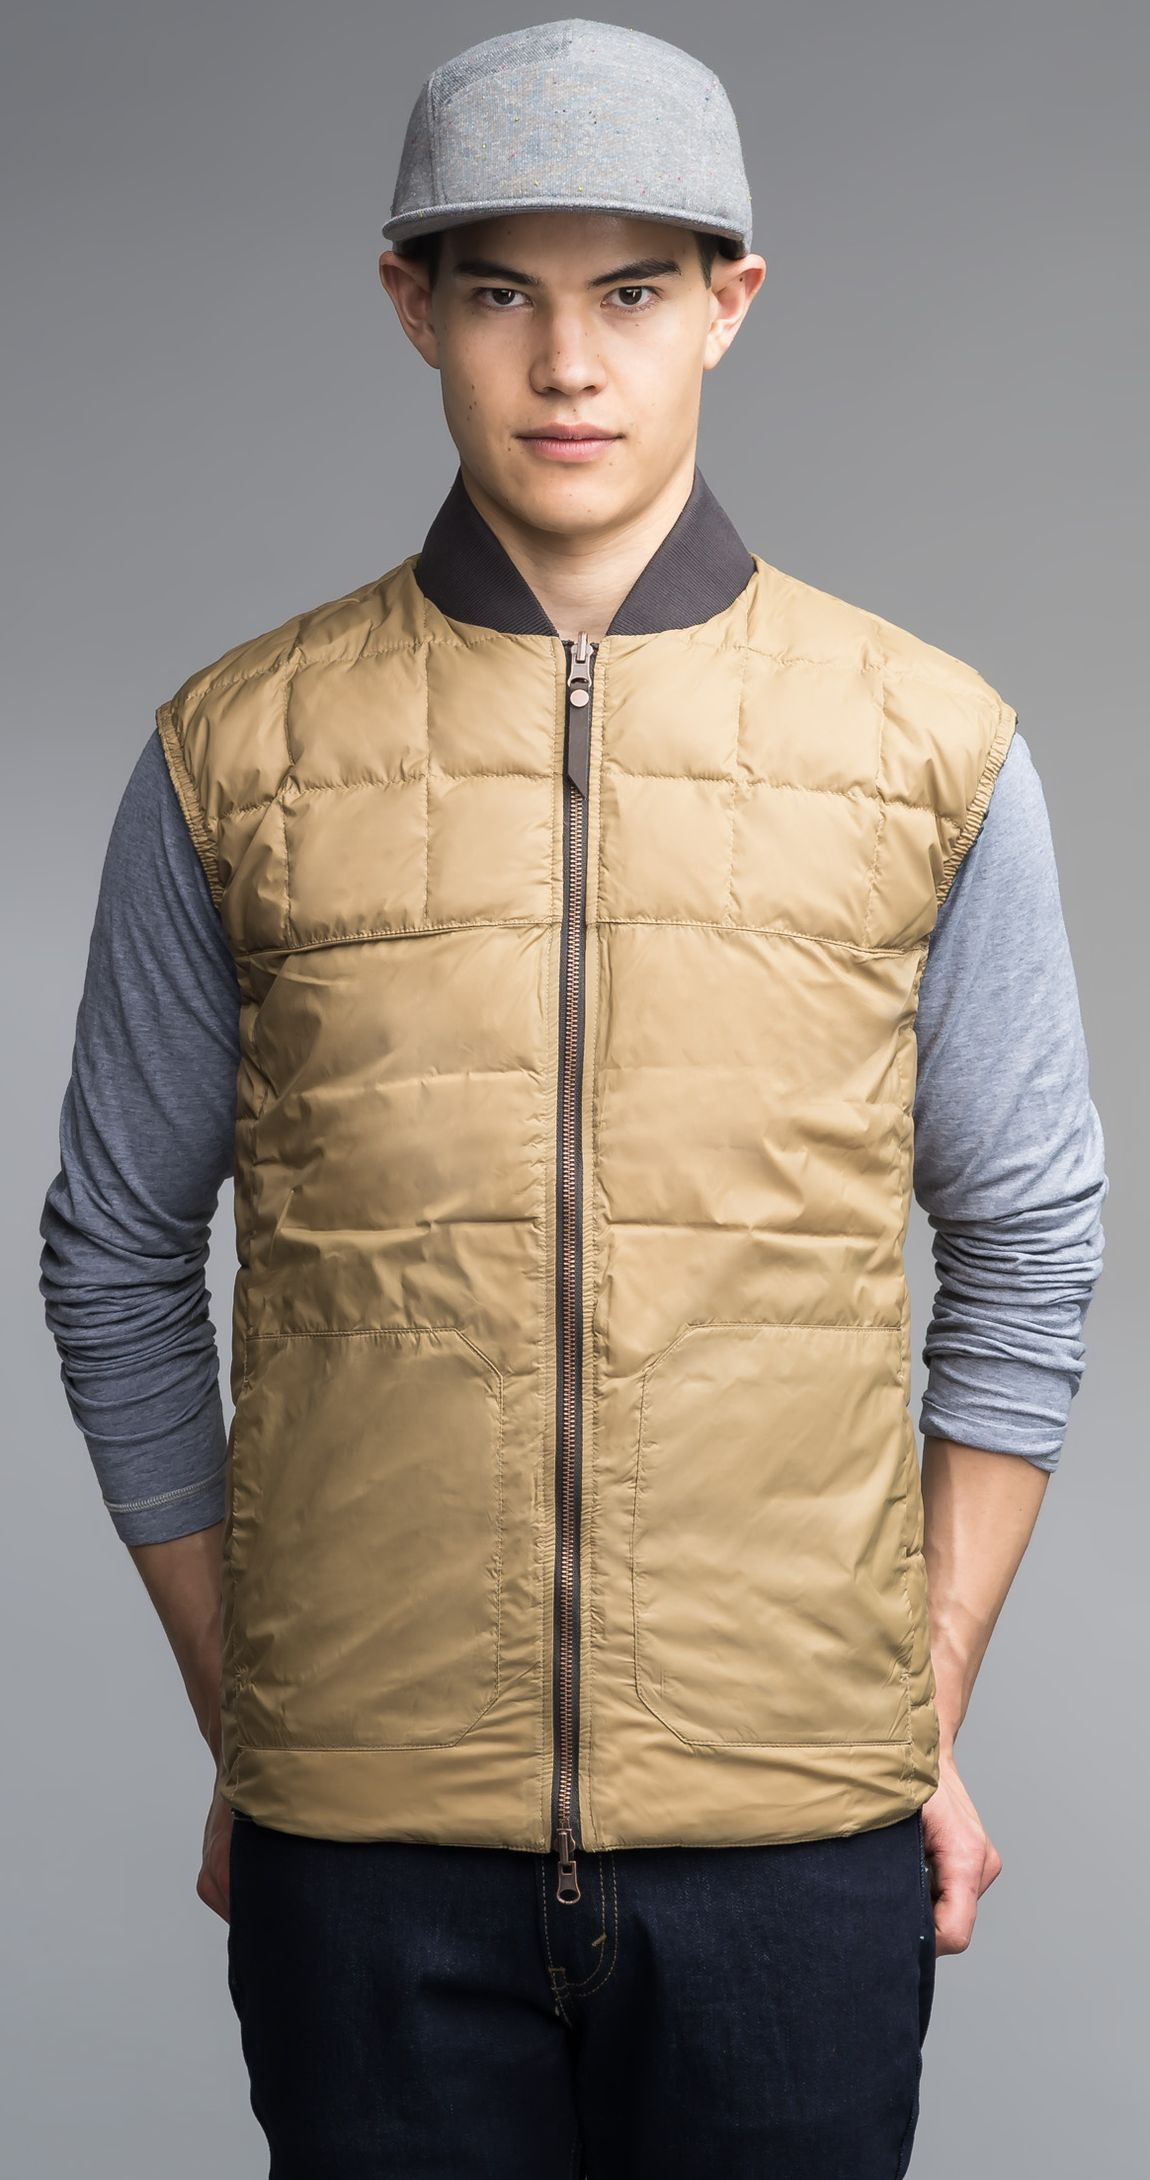 Aprilwetter: Cooles, klassisches Outfit für Männer